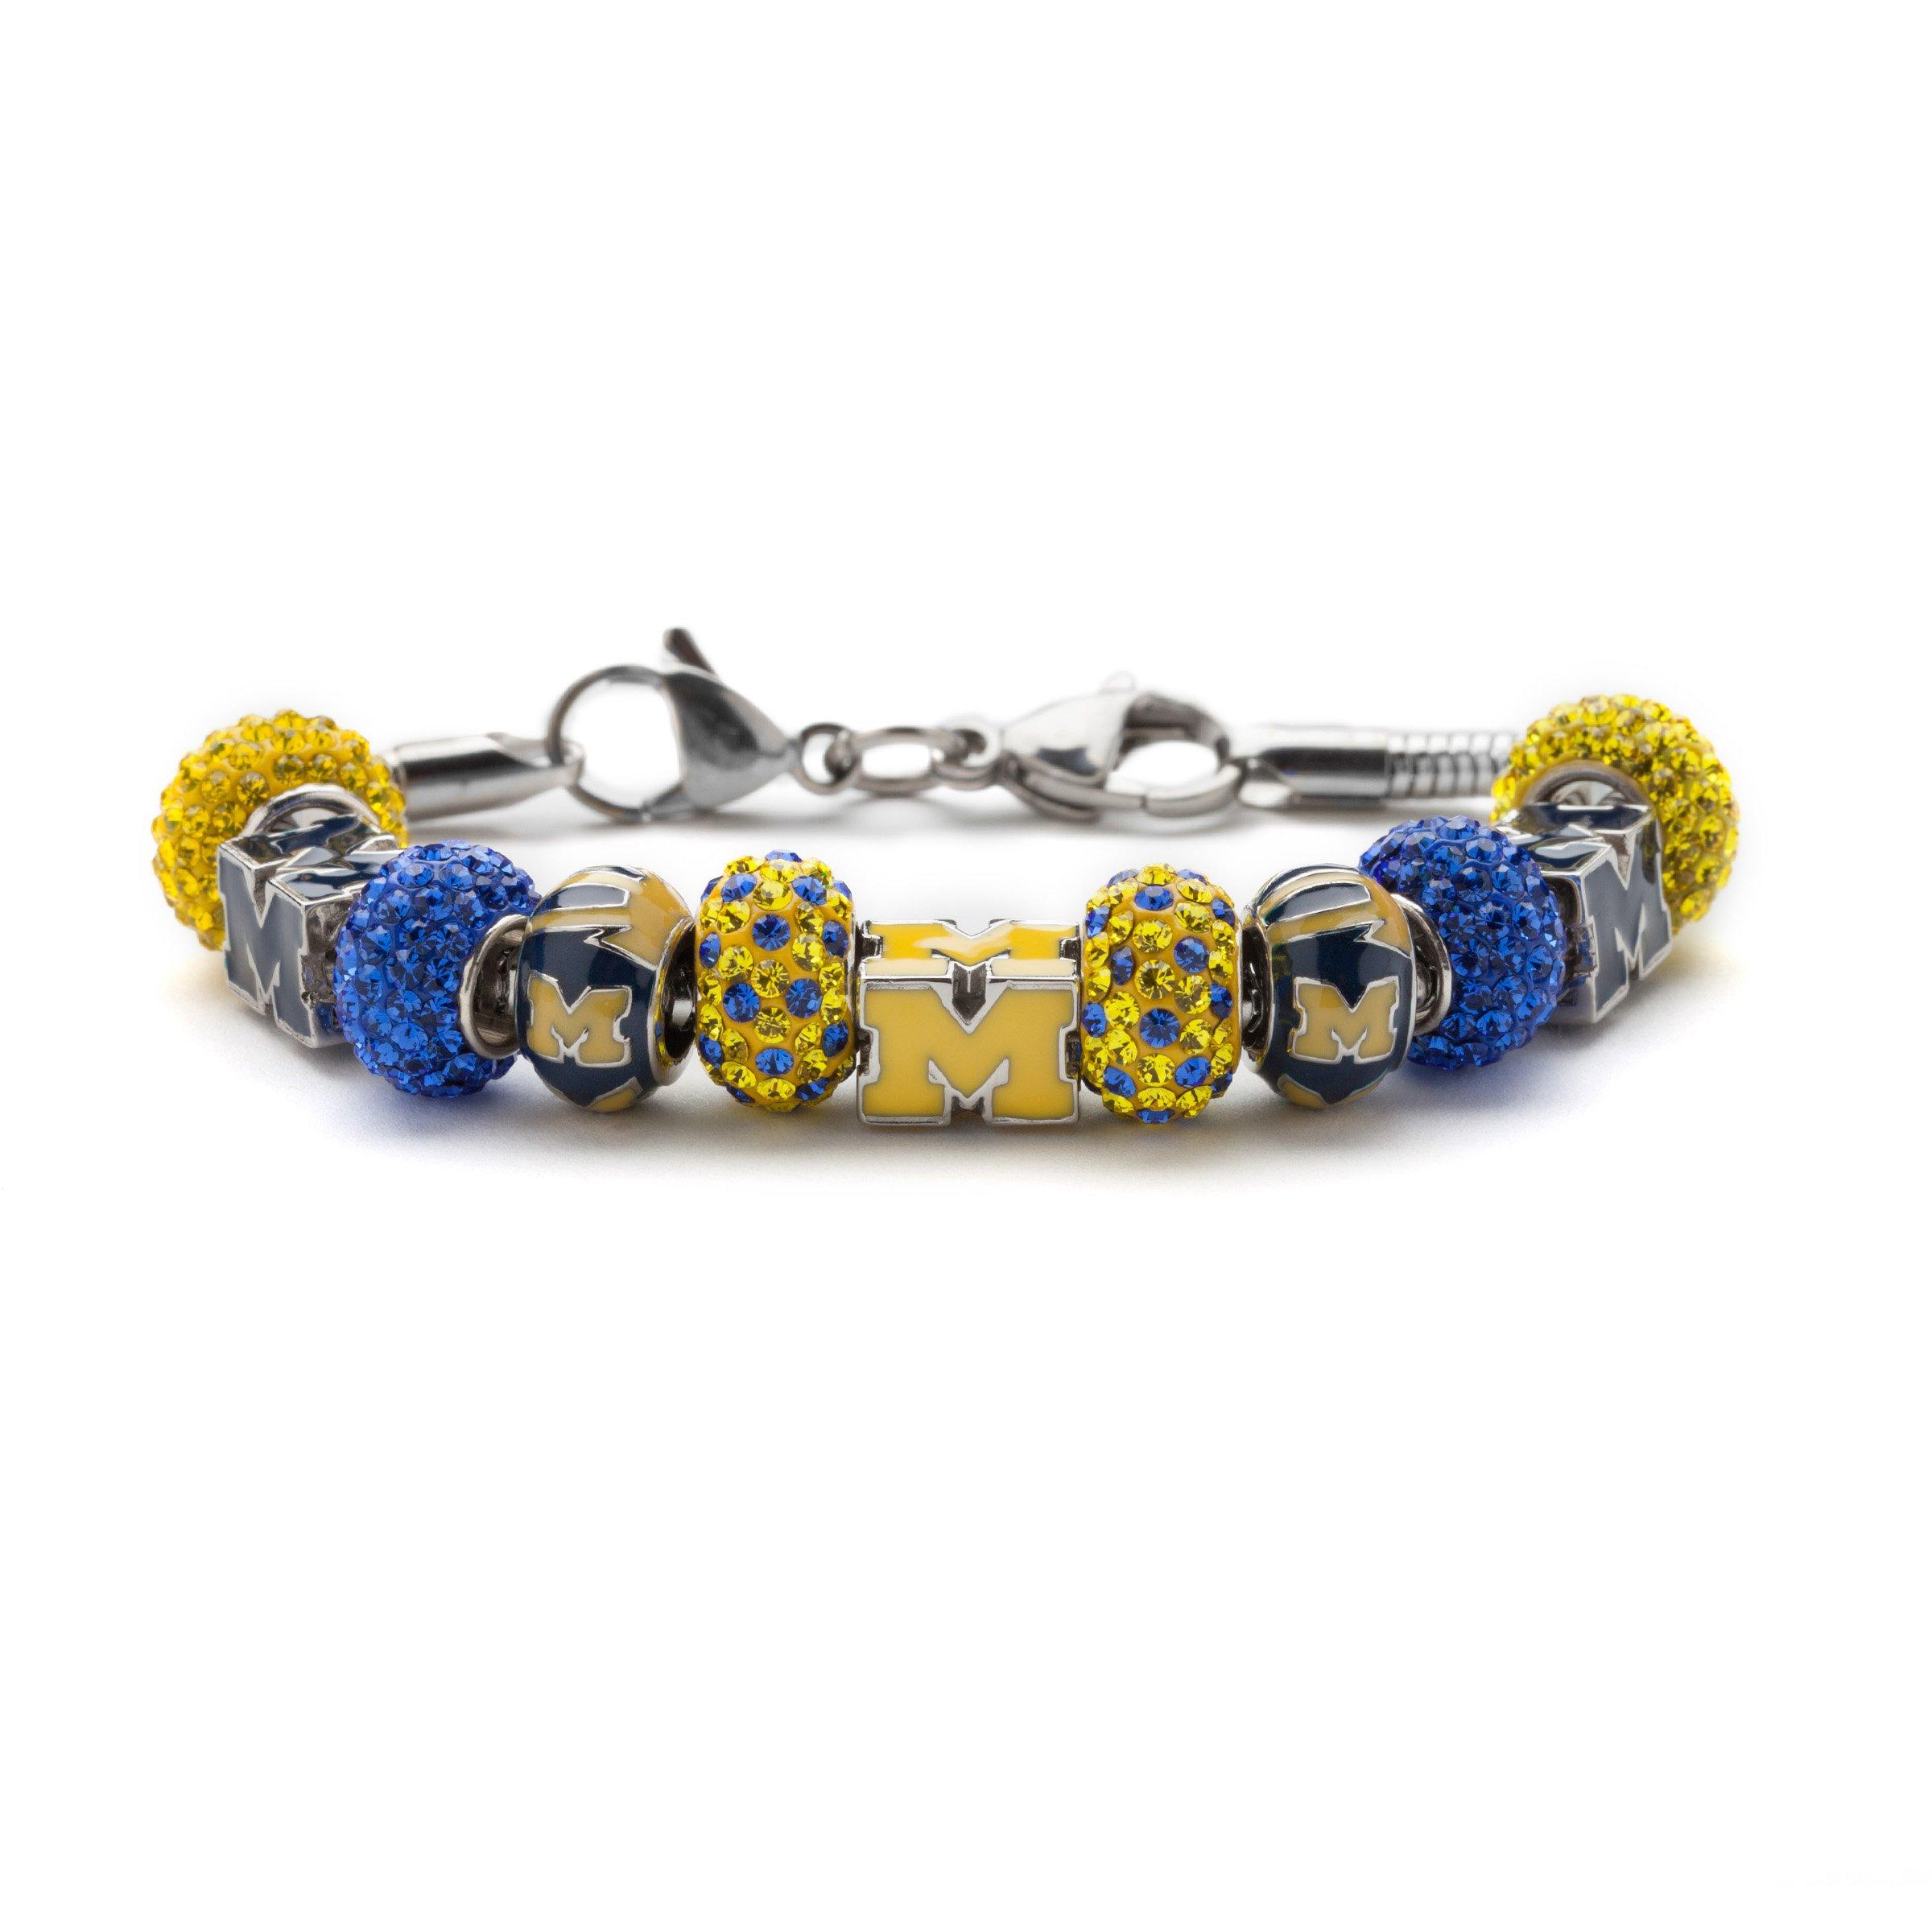 University of Michigan Bracelet | UM Wolverines Block M Bead Charm Bracelet | Officially Licensed University of Michigan Jewelry | UM Gifts | Michigan Wolverines | UM Jewelry | Stainless Steel